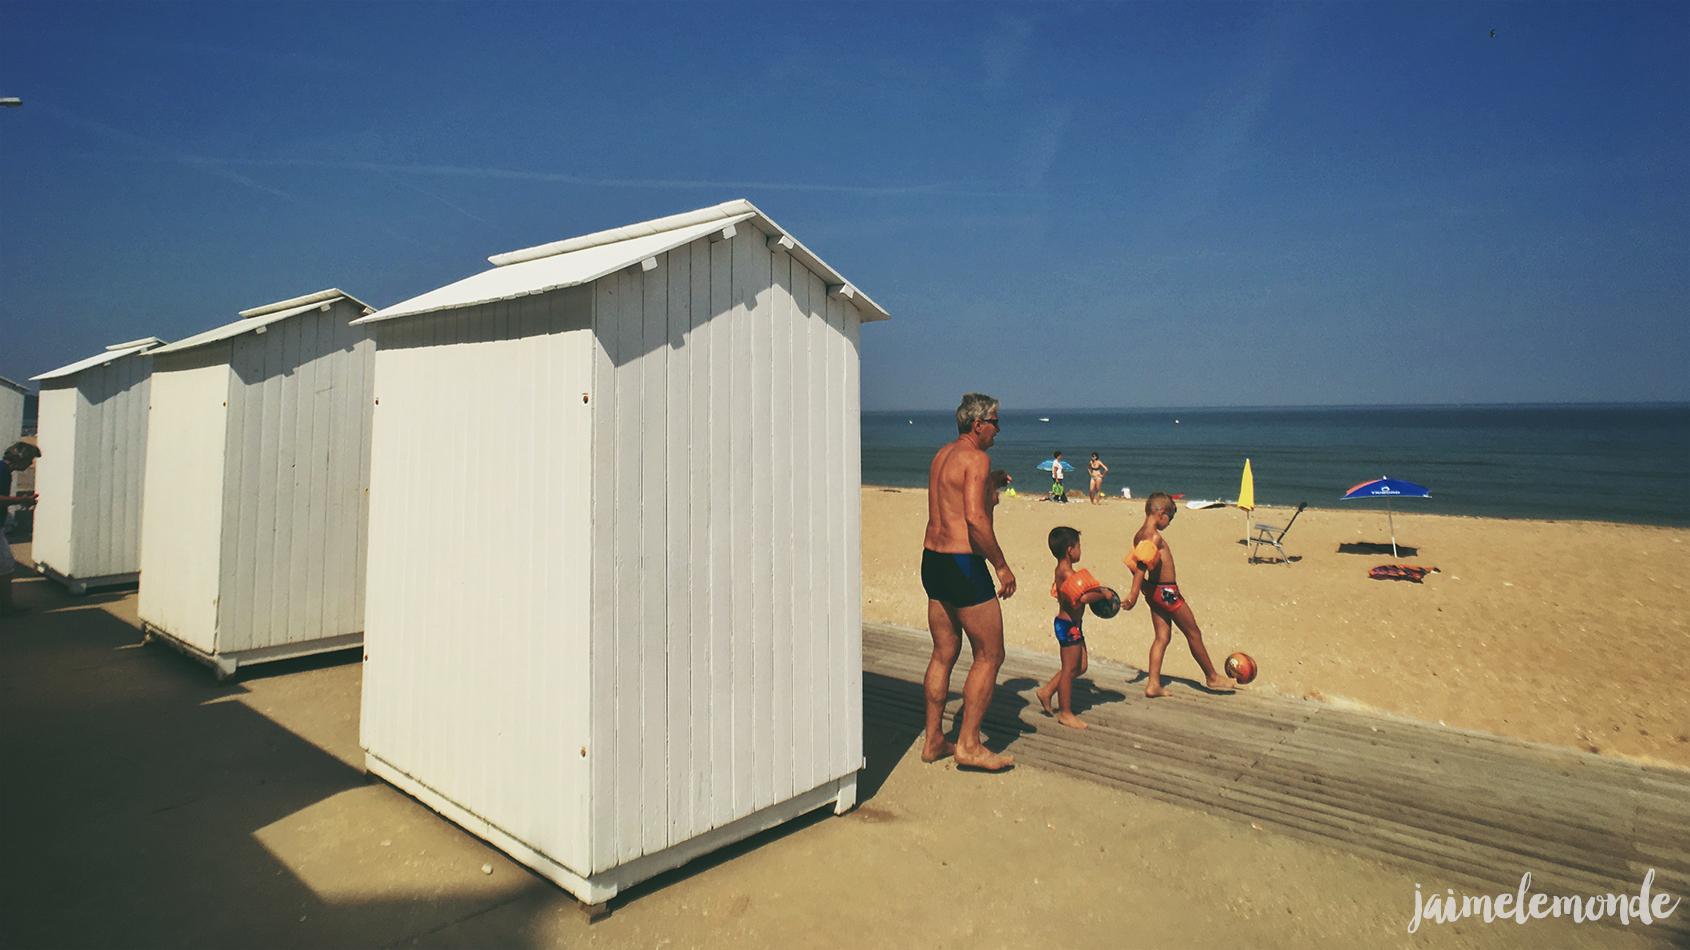 Pixter - Grand angle pro - Blonville sur mer - ©jaimelemonde (8)